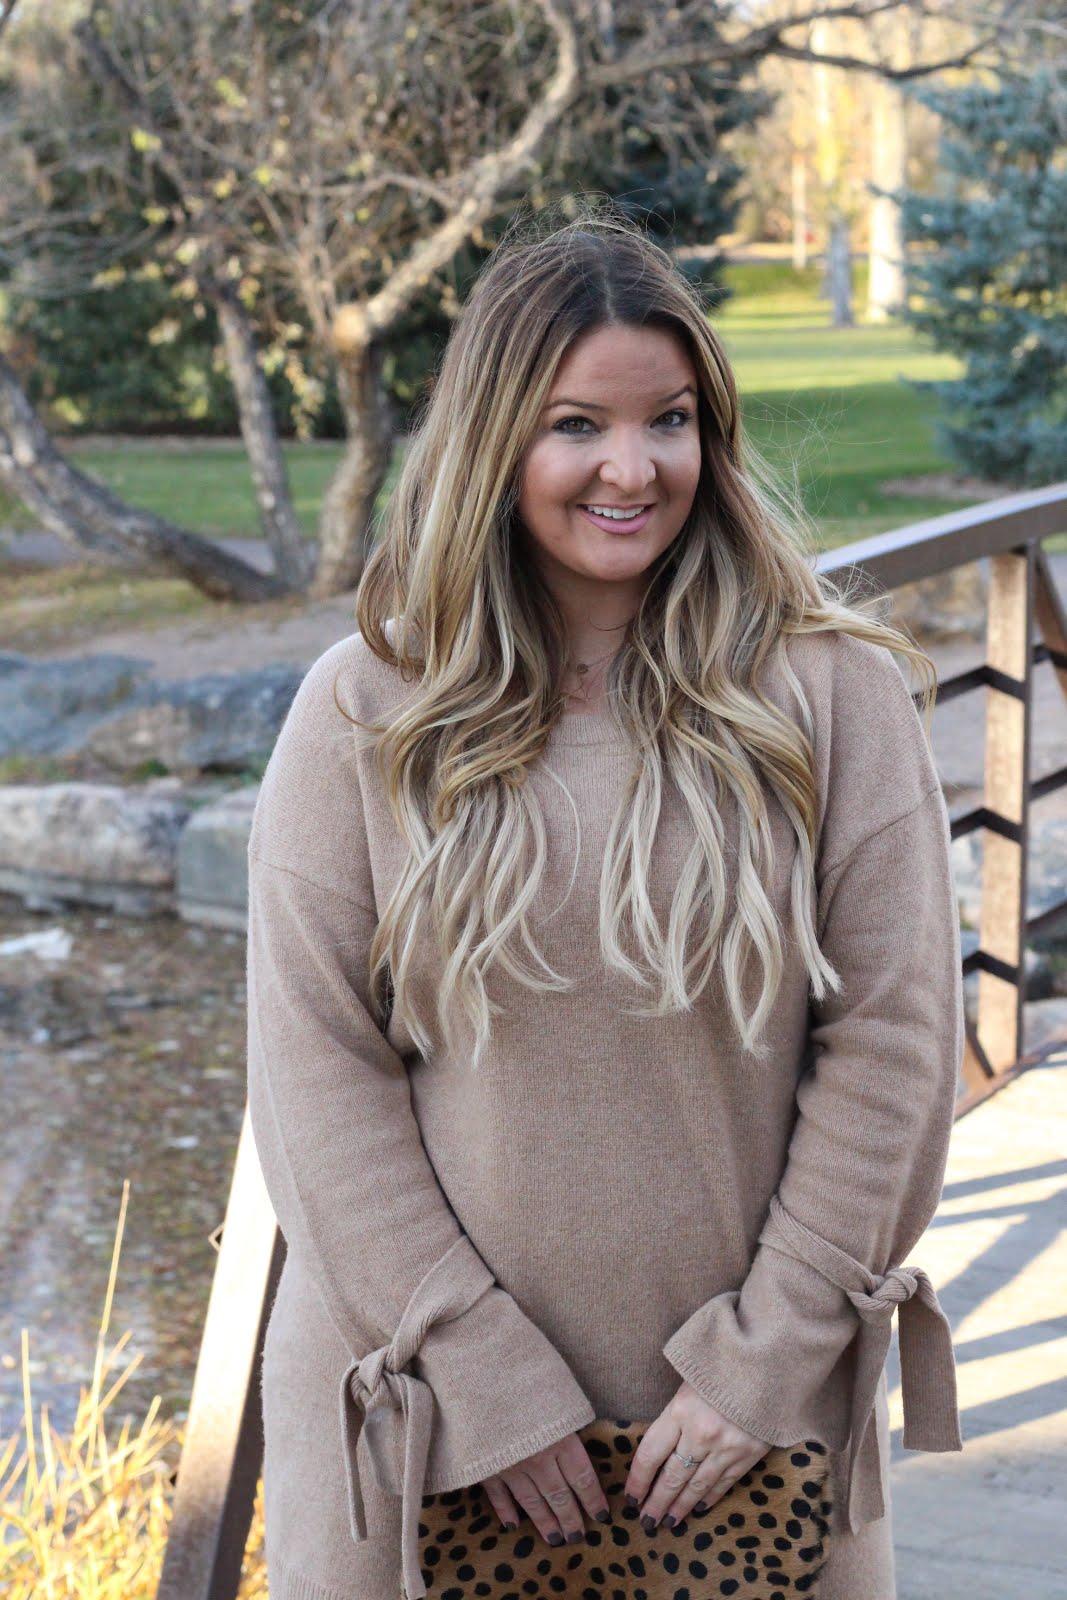 Tan sweater dress and Brown OTK boots by Denver fashion blogger Delayna Denaye